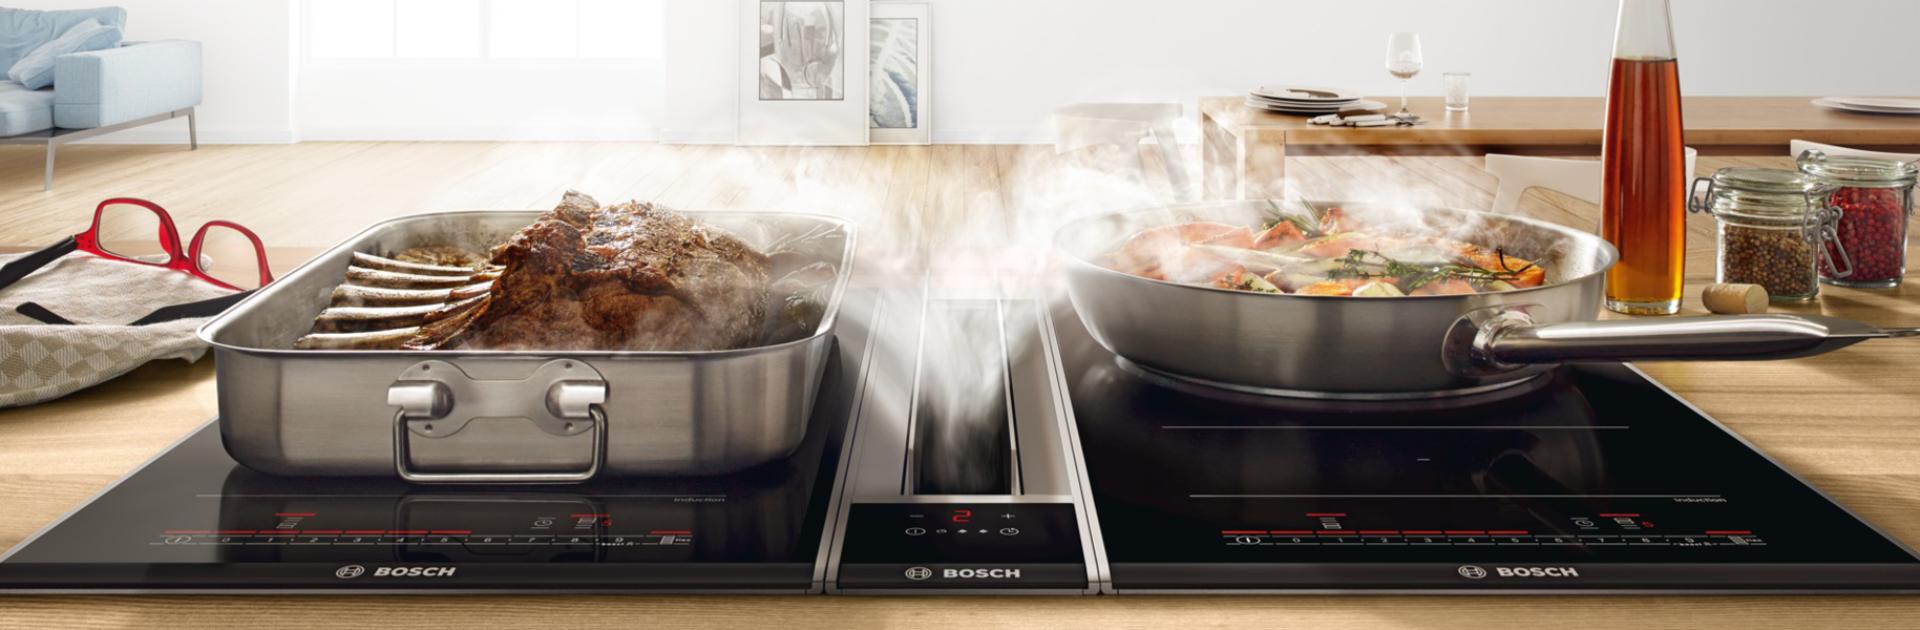 Bosch keukenapparatuur kopen | Satink Keukens